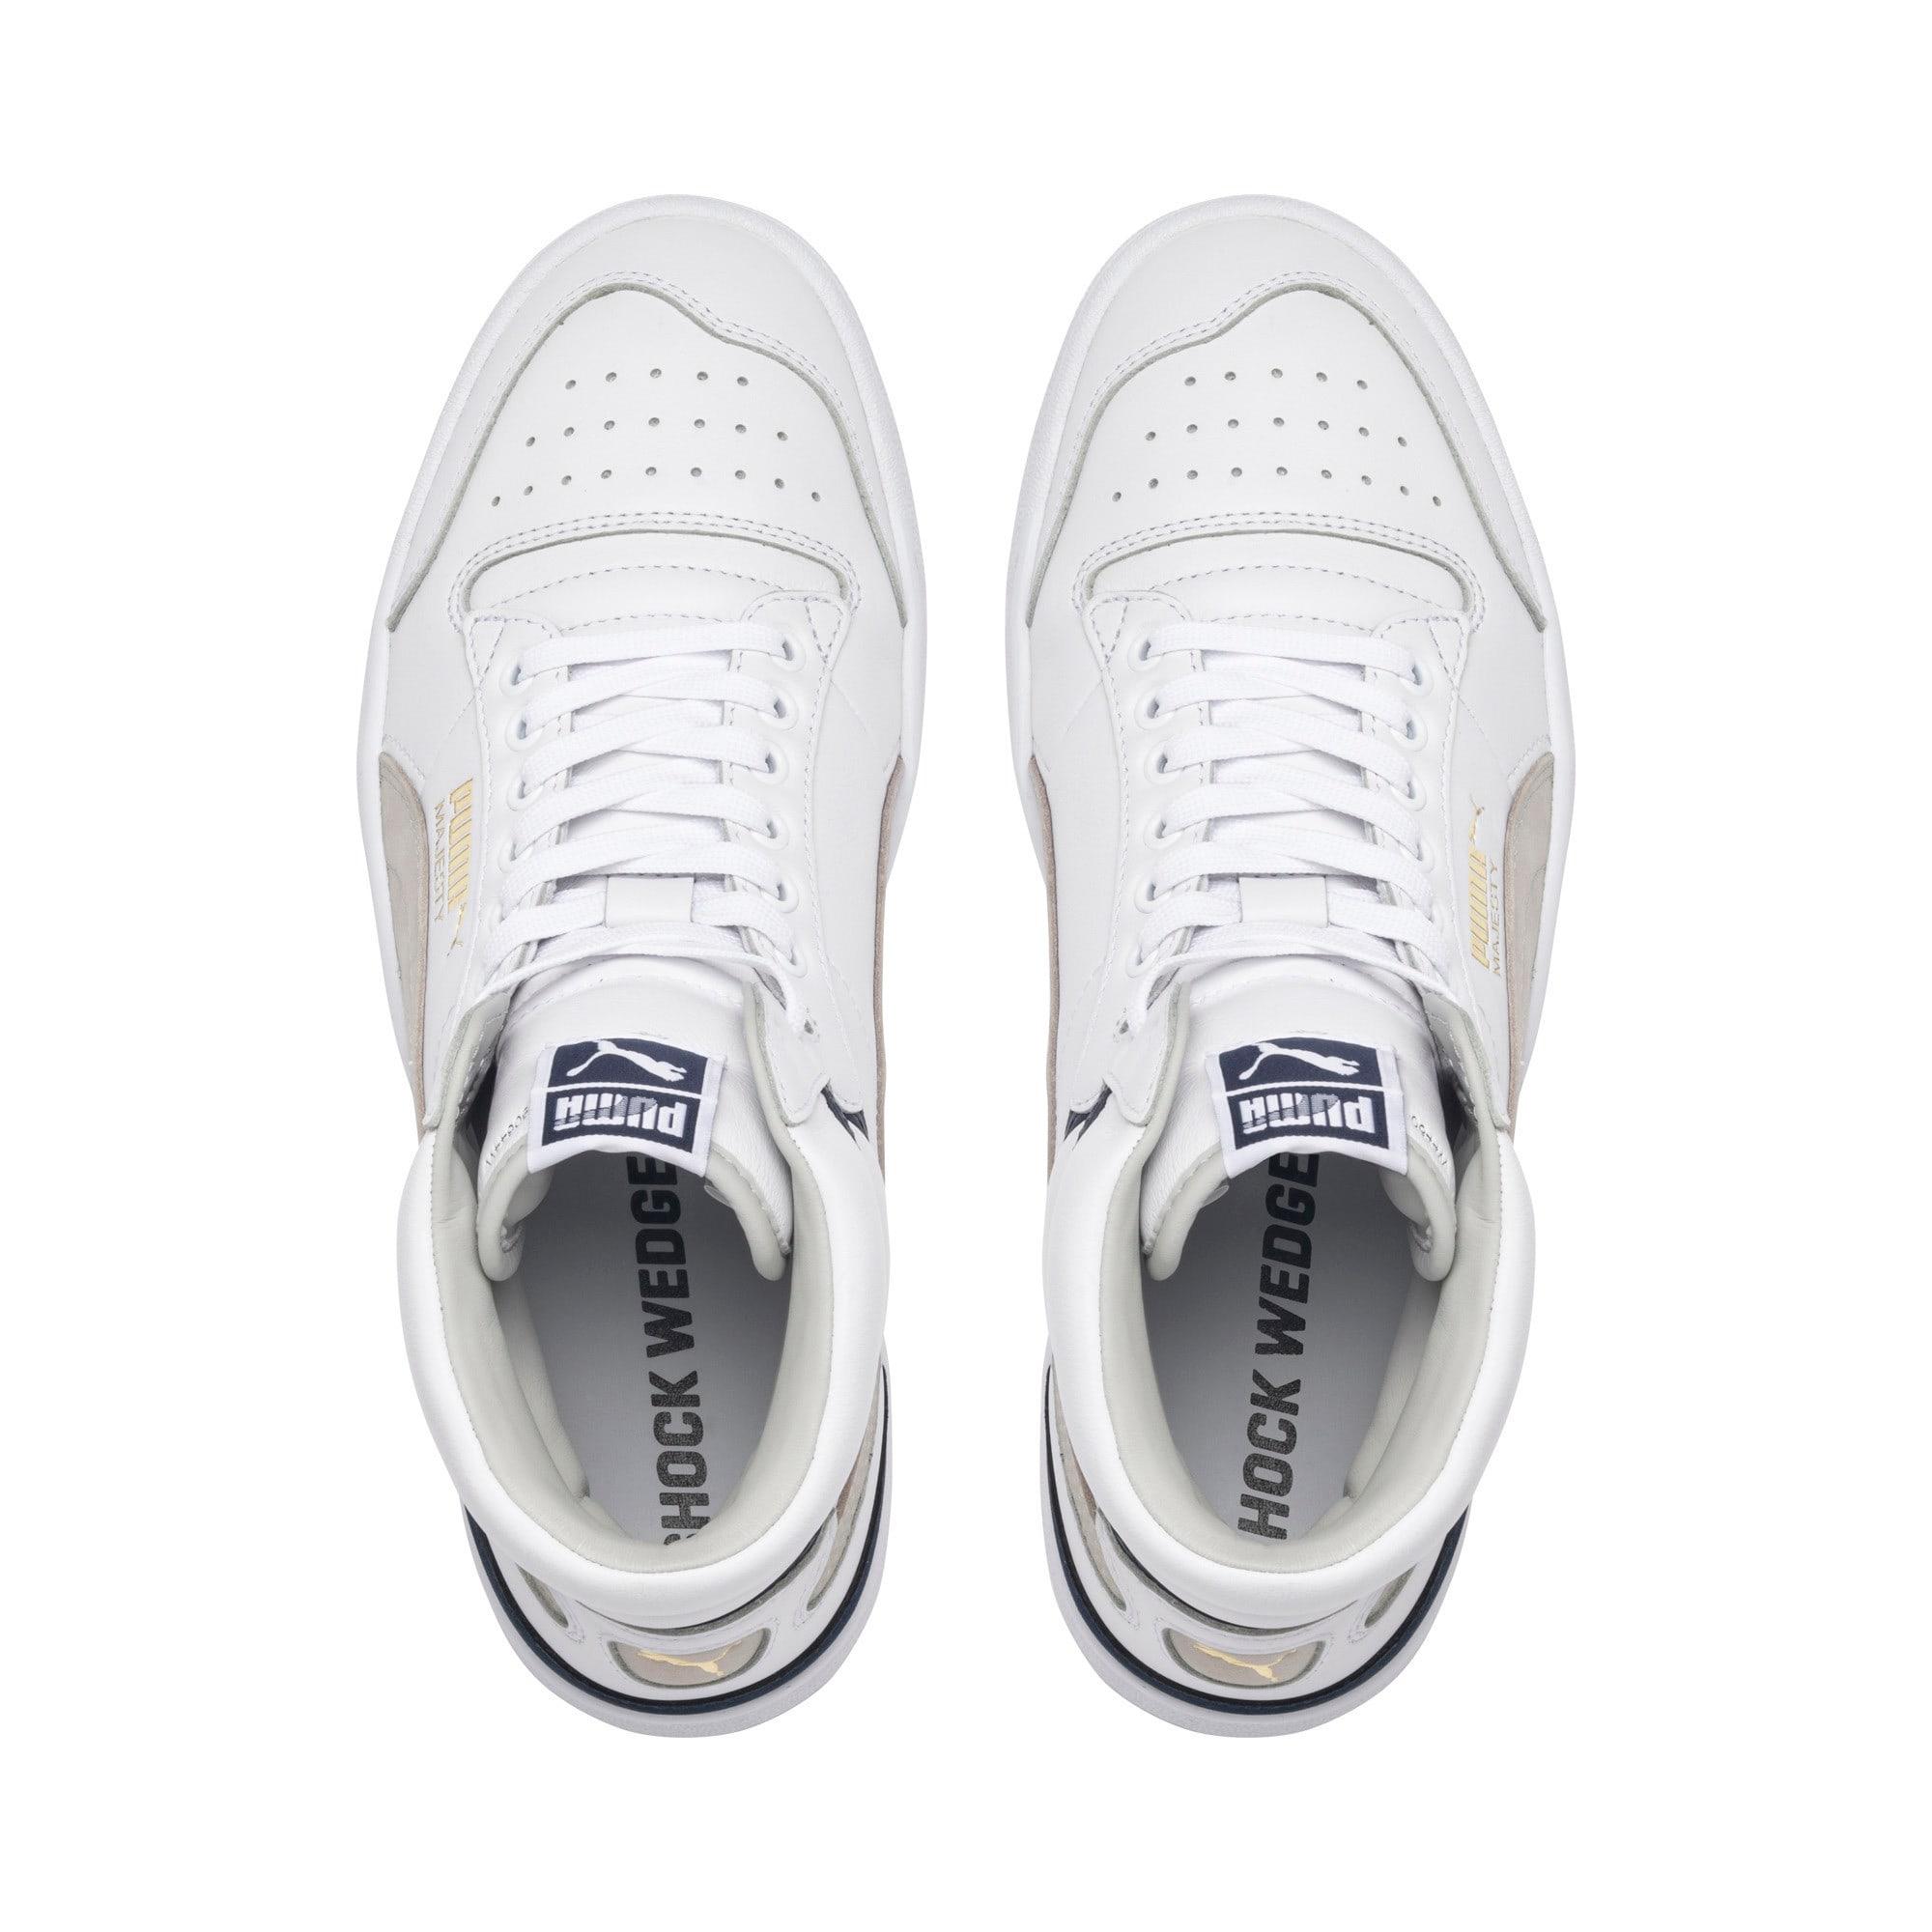 Miniatura 6 de Zapatos deportivos de caña media Ralph Sampson OG, Puma Wht-Gray Violet-Peacoat, mediano